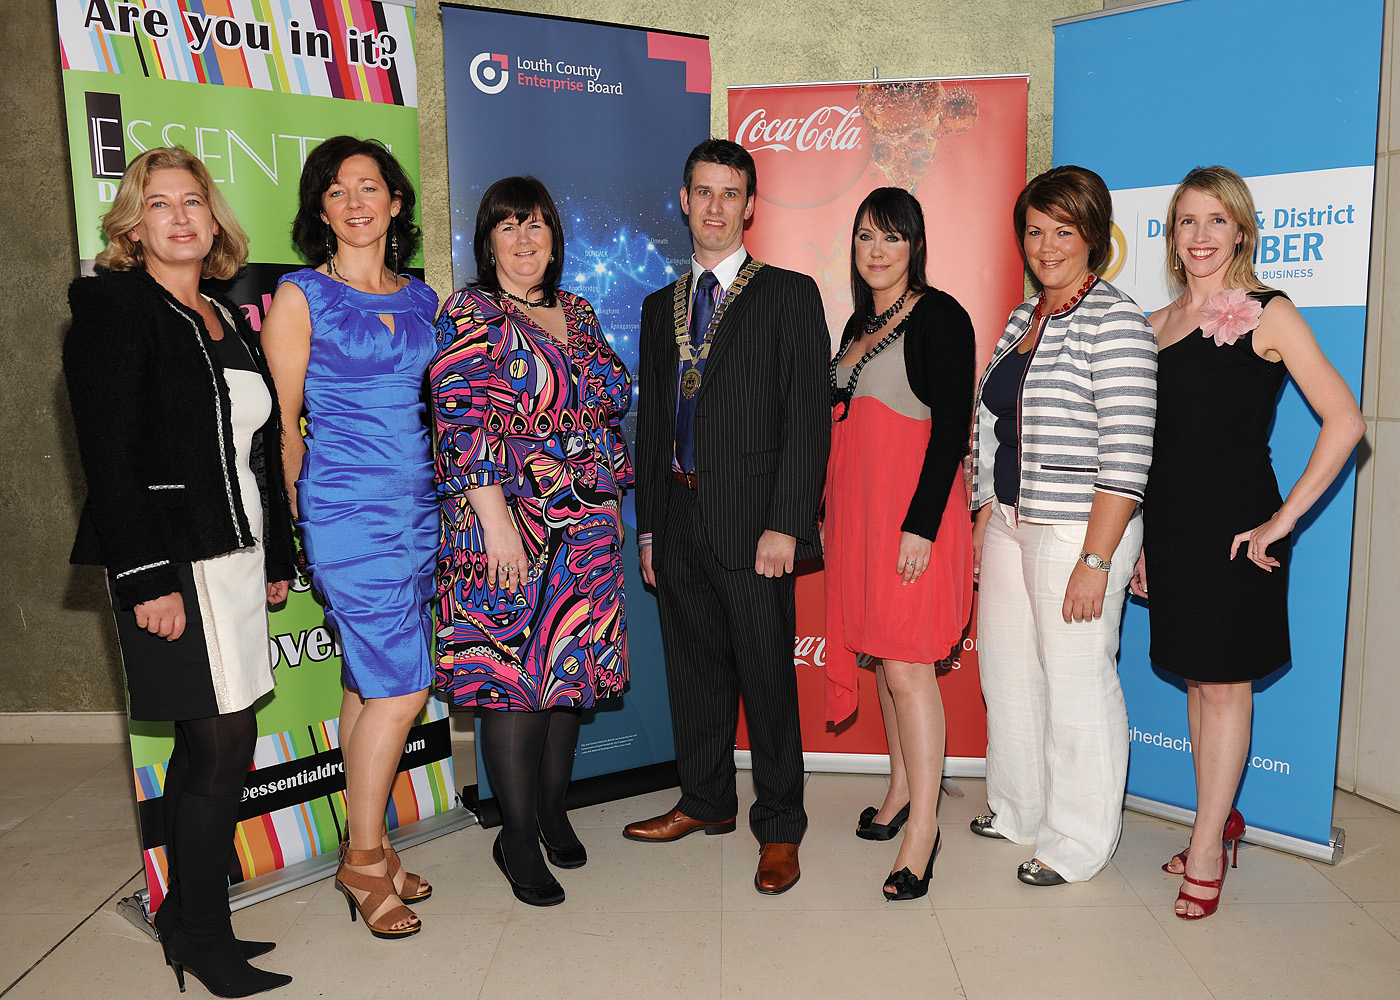 Waters-Siobhan-Woods-Sarah-Mallon-Graham-Hughes-Caoimhe-Mulroy-Ladonna-Mc-Cartan-Denise-Fay.jpg